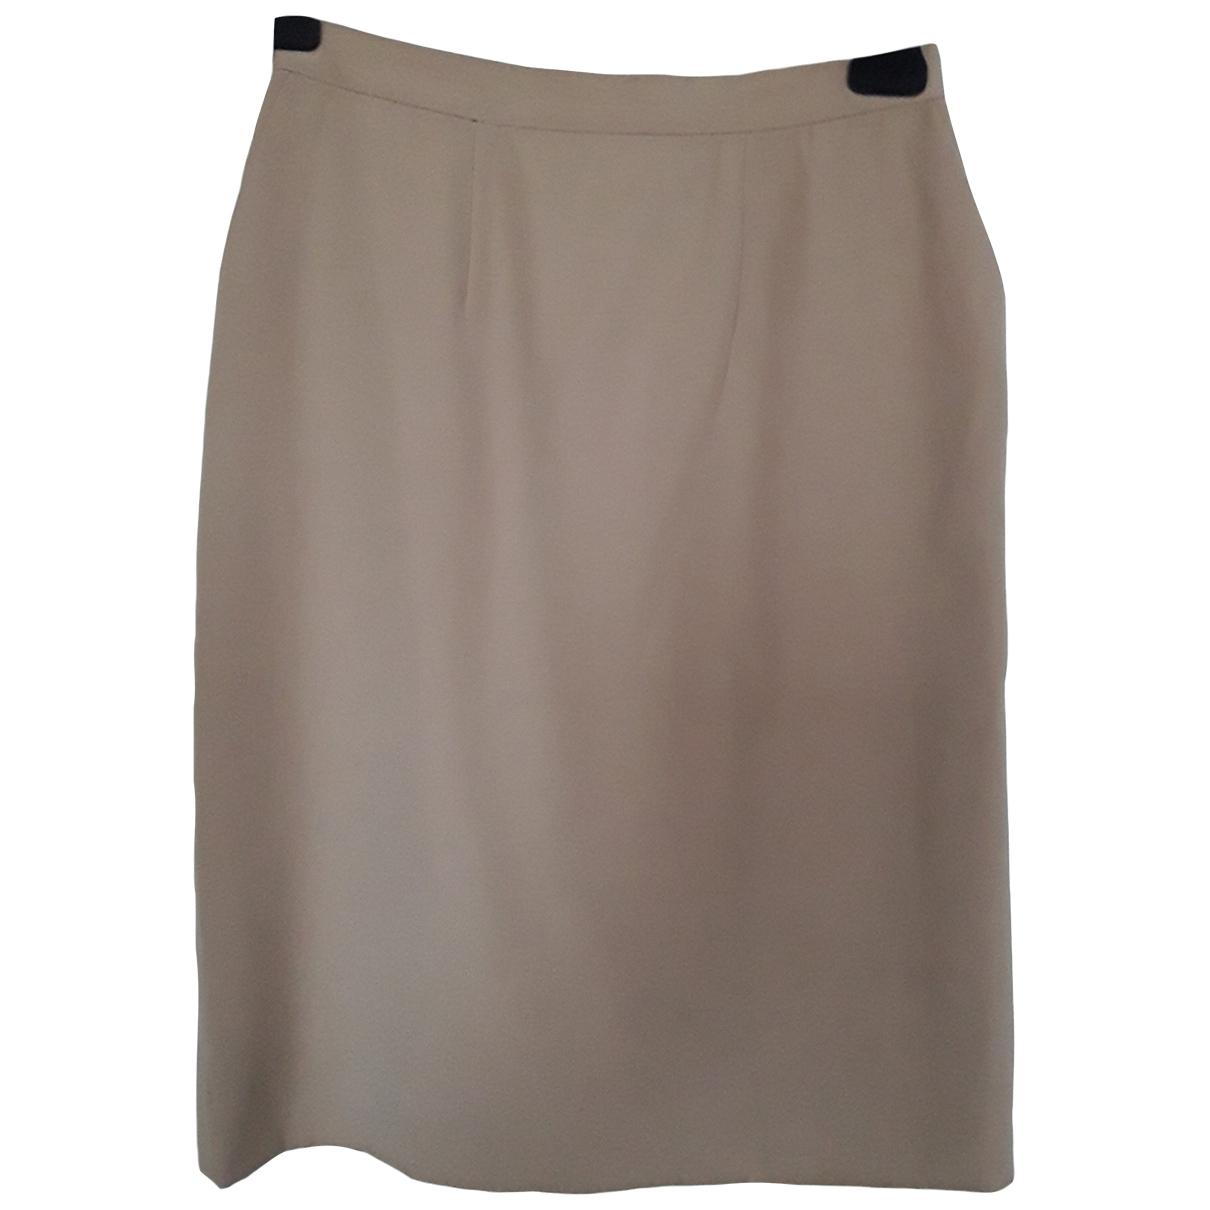 Dior \N Beige Wool skirt for Women 36 FR